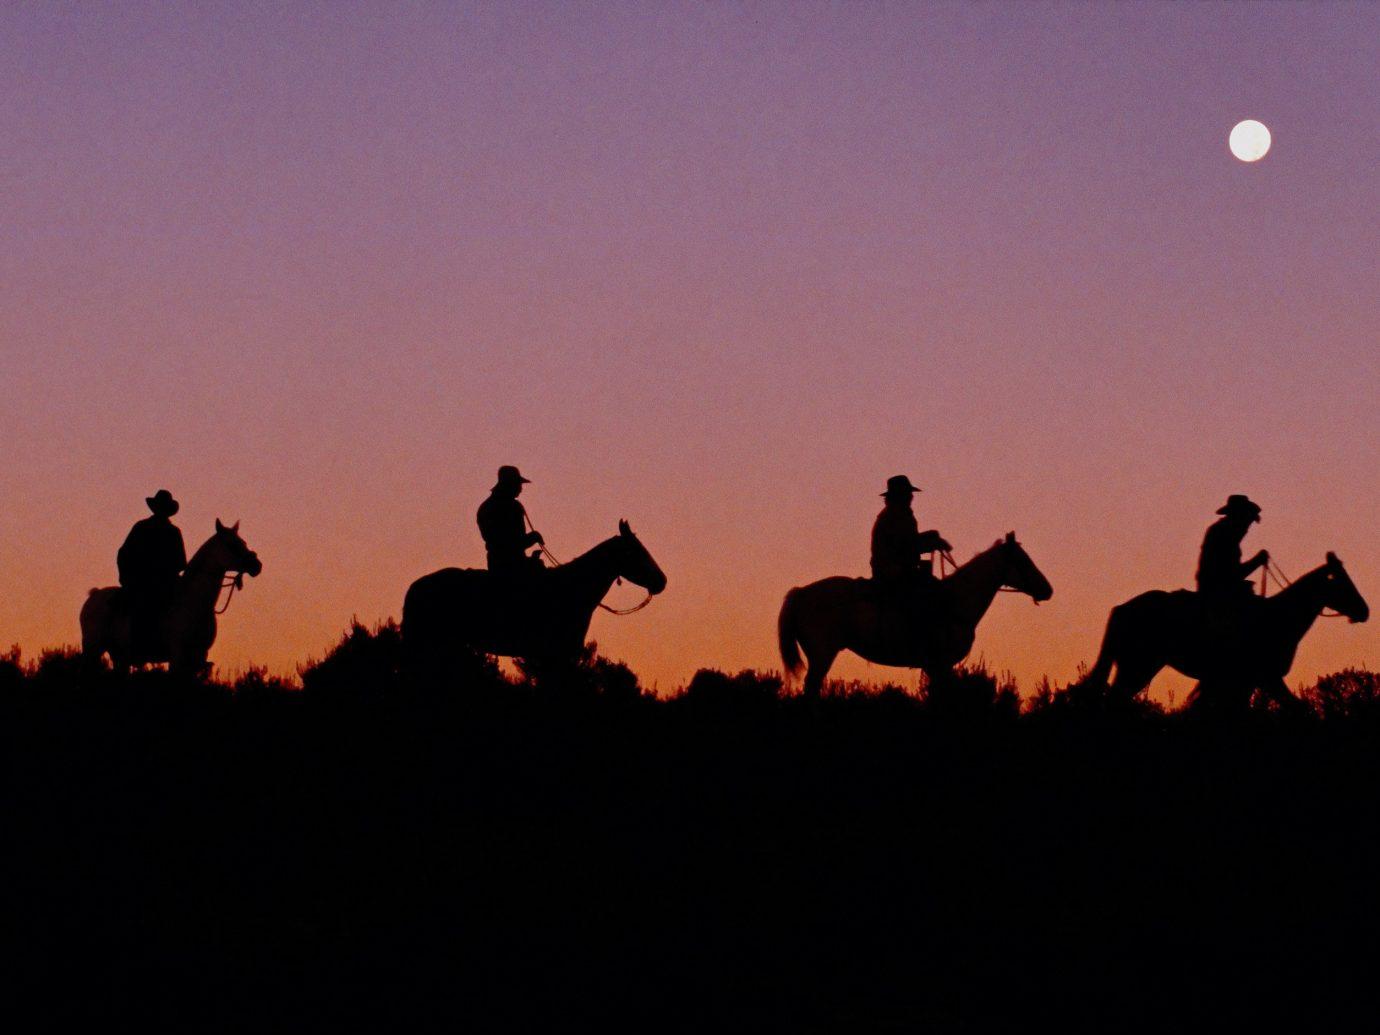 Adventure sky outdoor horse like mammal dark silhouette horse sunrise Sunset evening ecoregion light mustang horse dusk dawn fun landscape plain field image aircraft